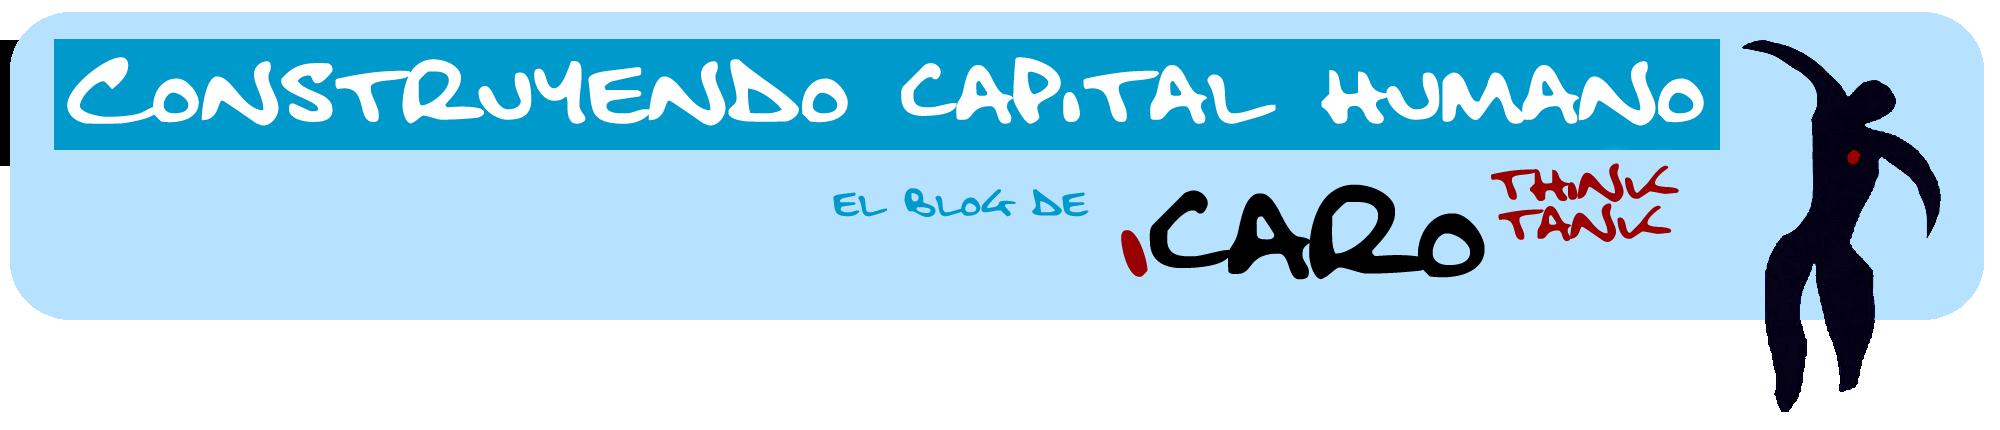 Blog Construyendo Capital Humano